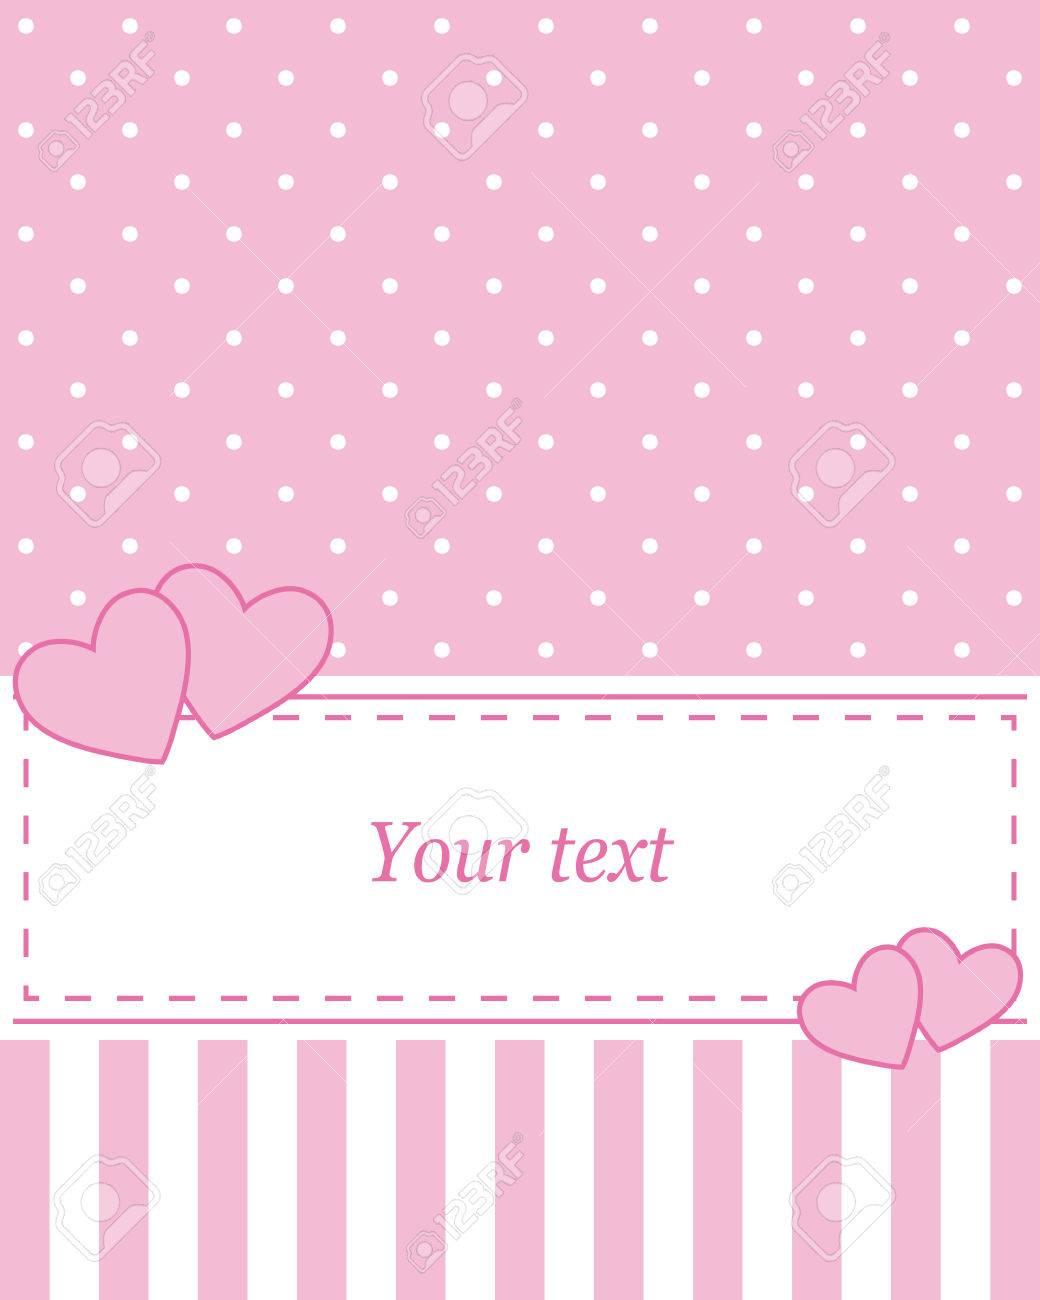 Elegant pink vector card advertising or wedding invitation with elegant pink vector card advertising or wedding invitation with polka dots on a white stopboris Images